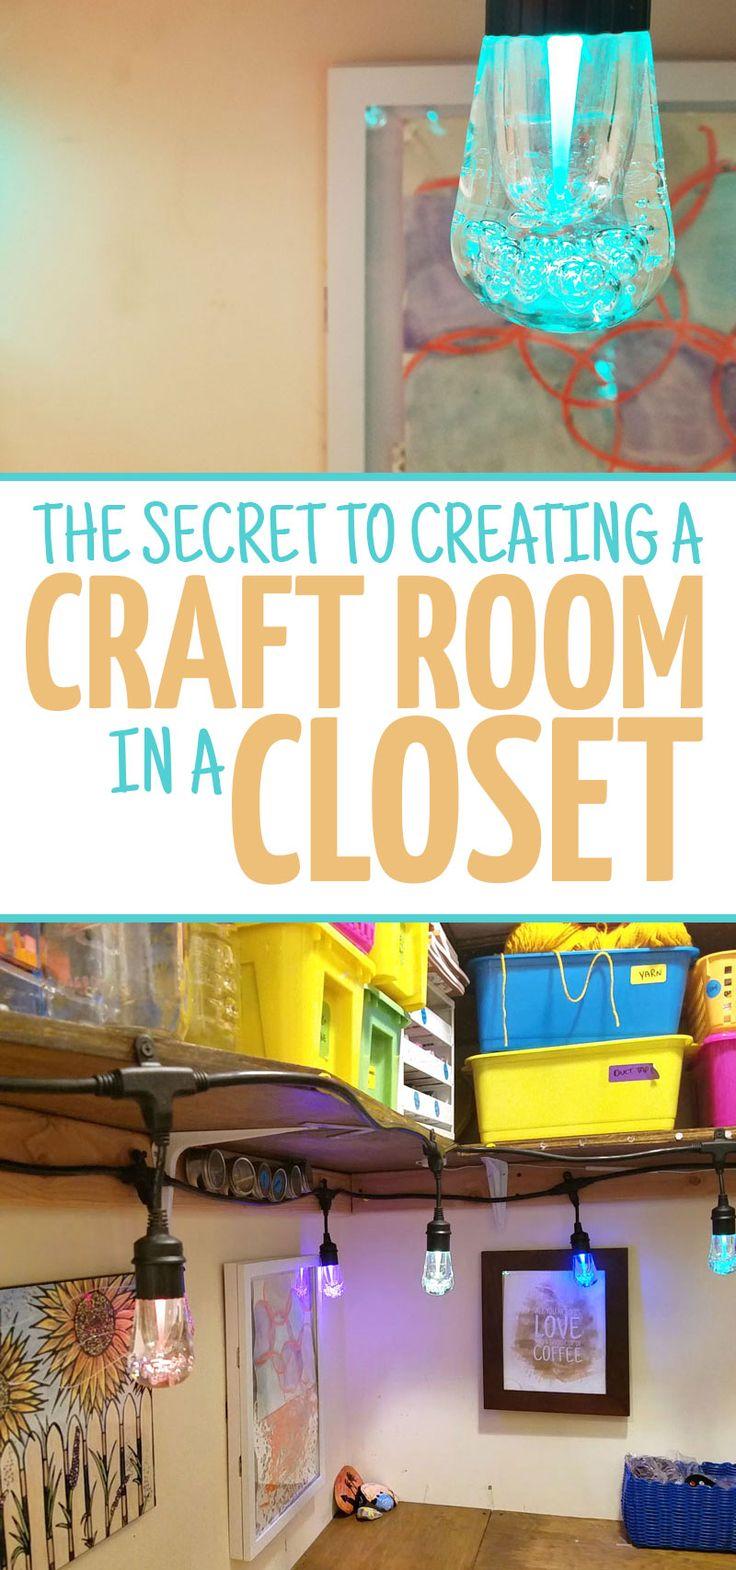 lighting craft room design. unique craft best 25 craft room lighting ideas on pinterest  organizing  organization and design for lighting room design